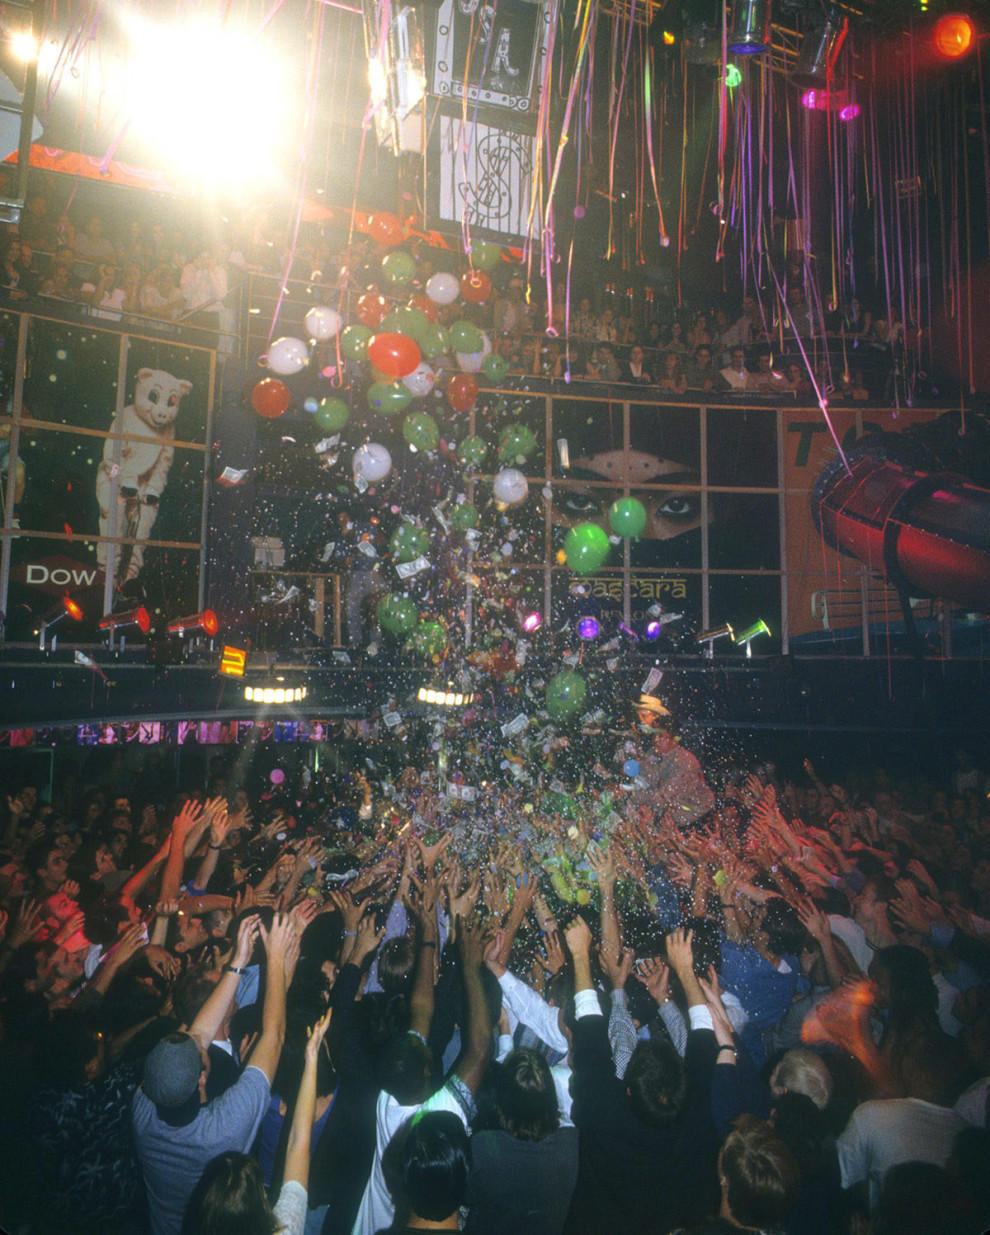 Swinger clubs parties in new york address, going commando embarrassment